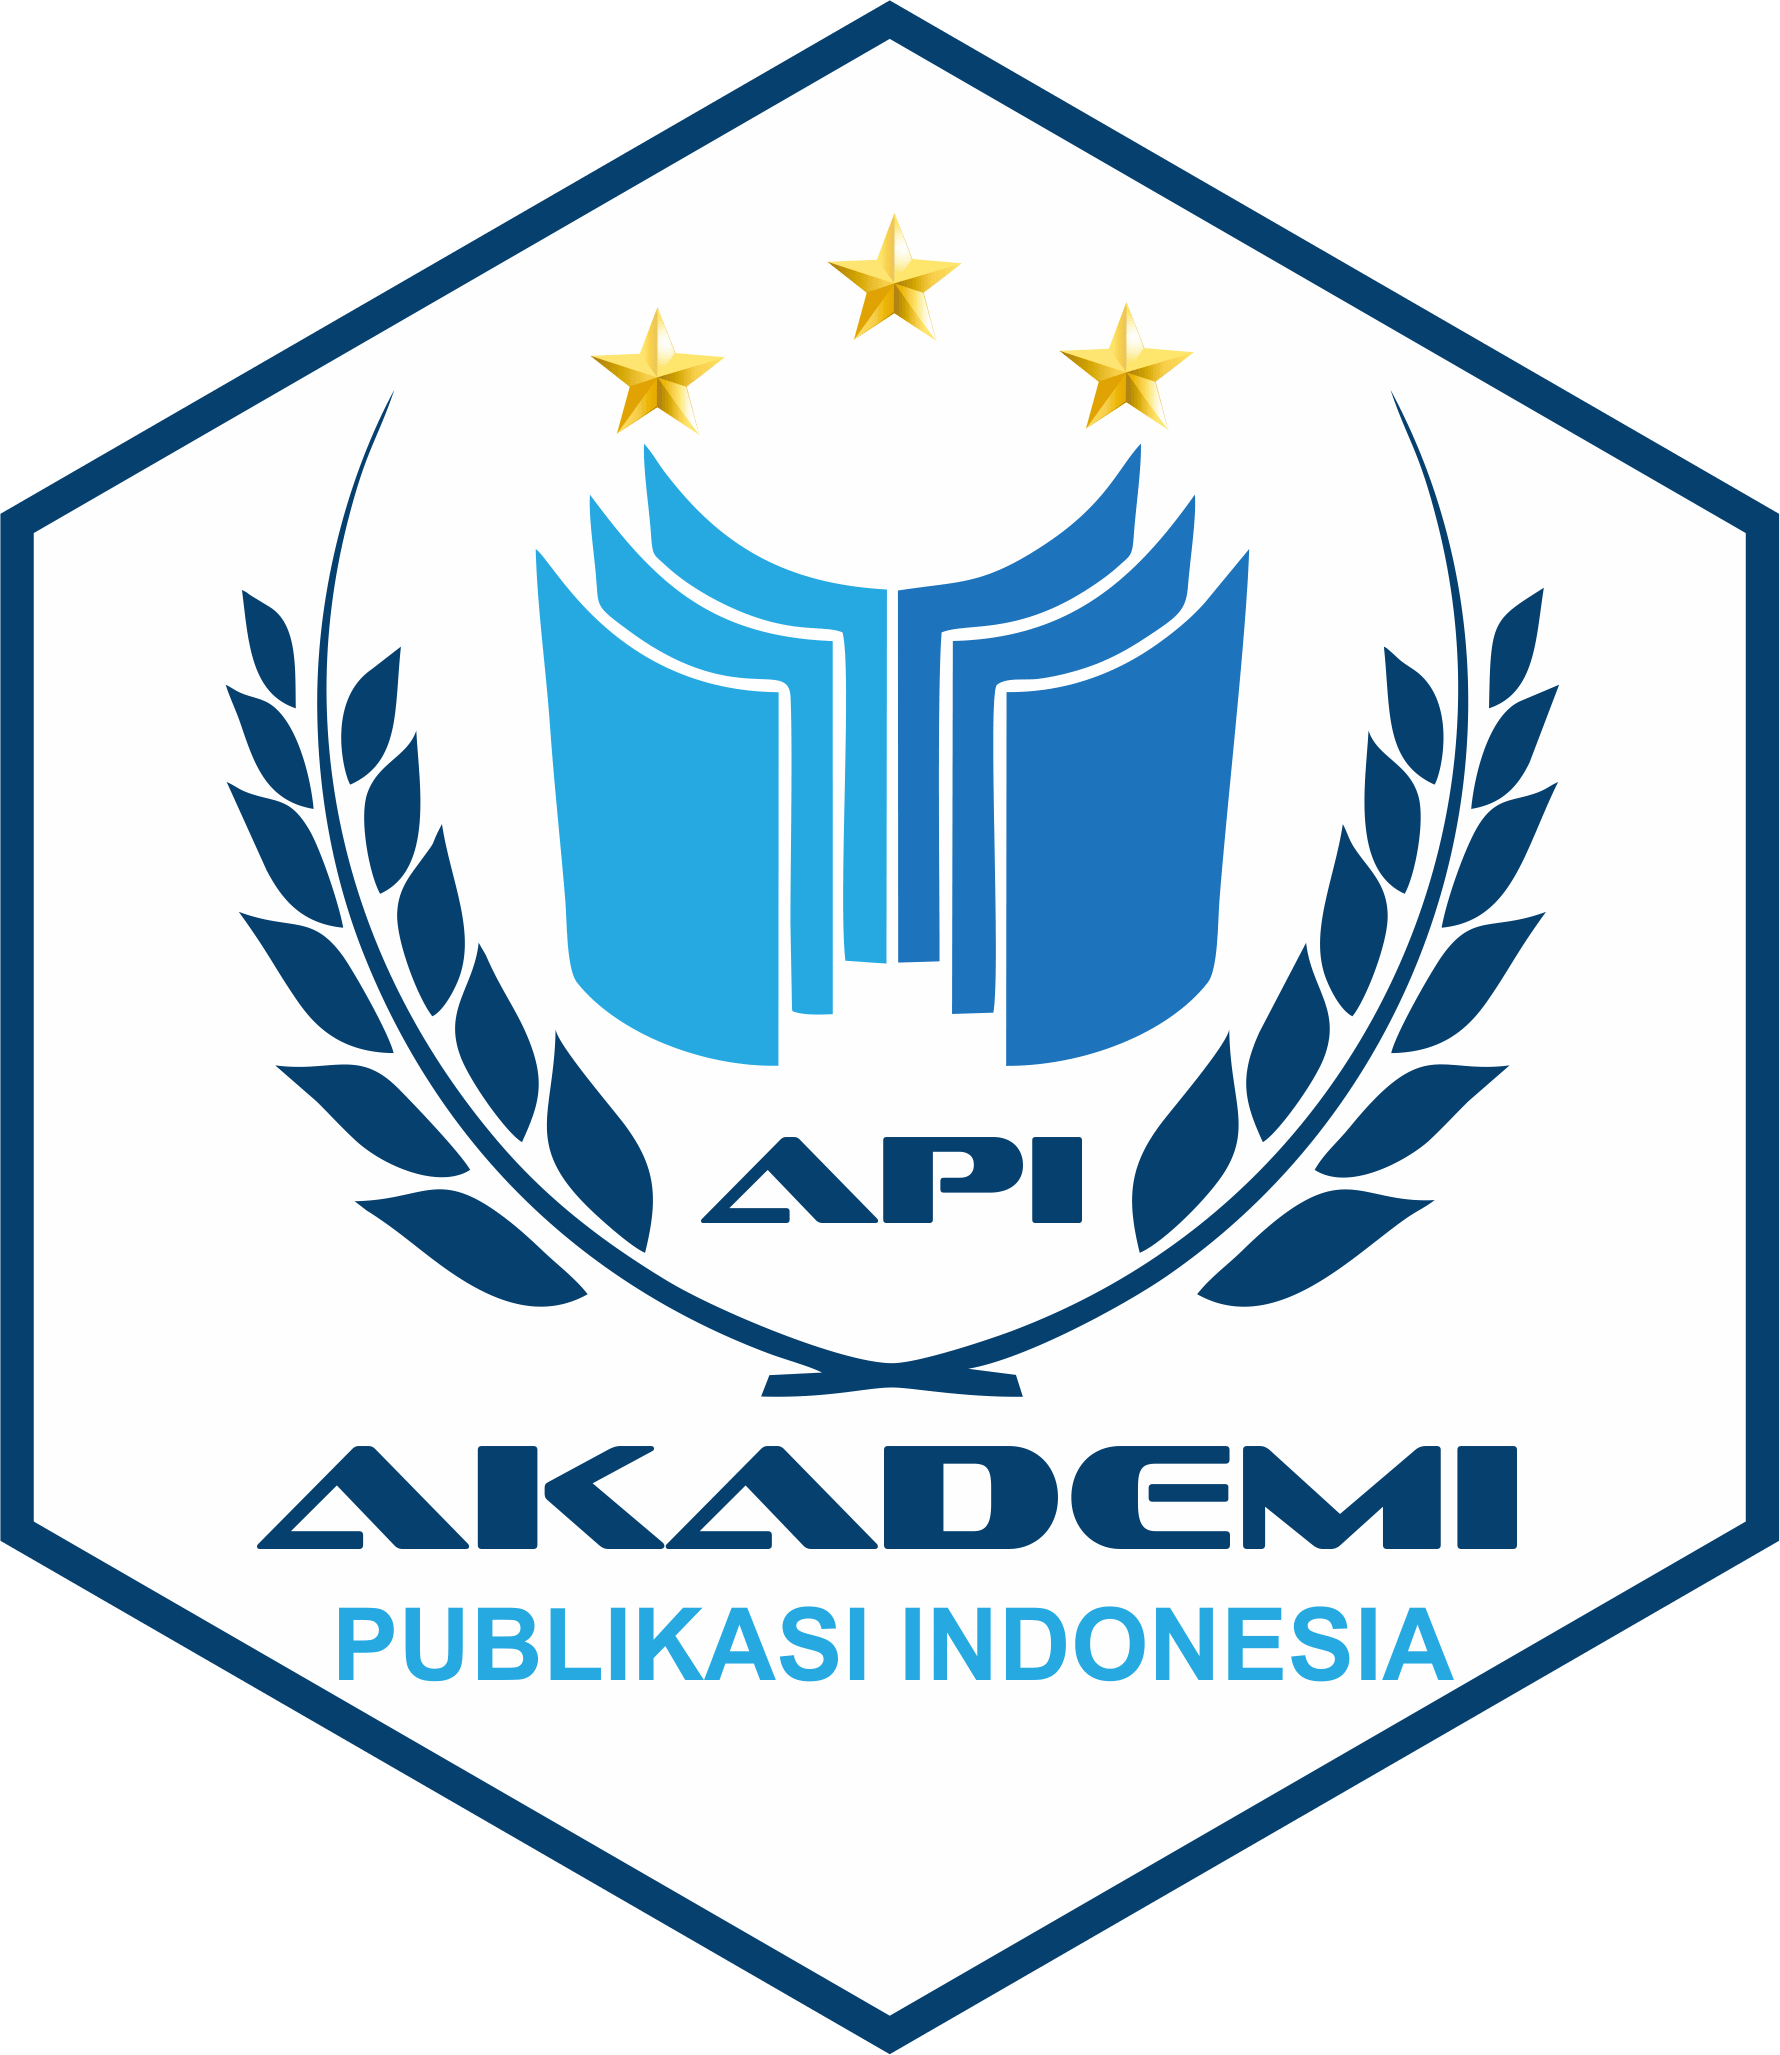 Akademi Publikasi Indonesia